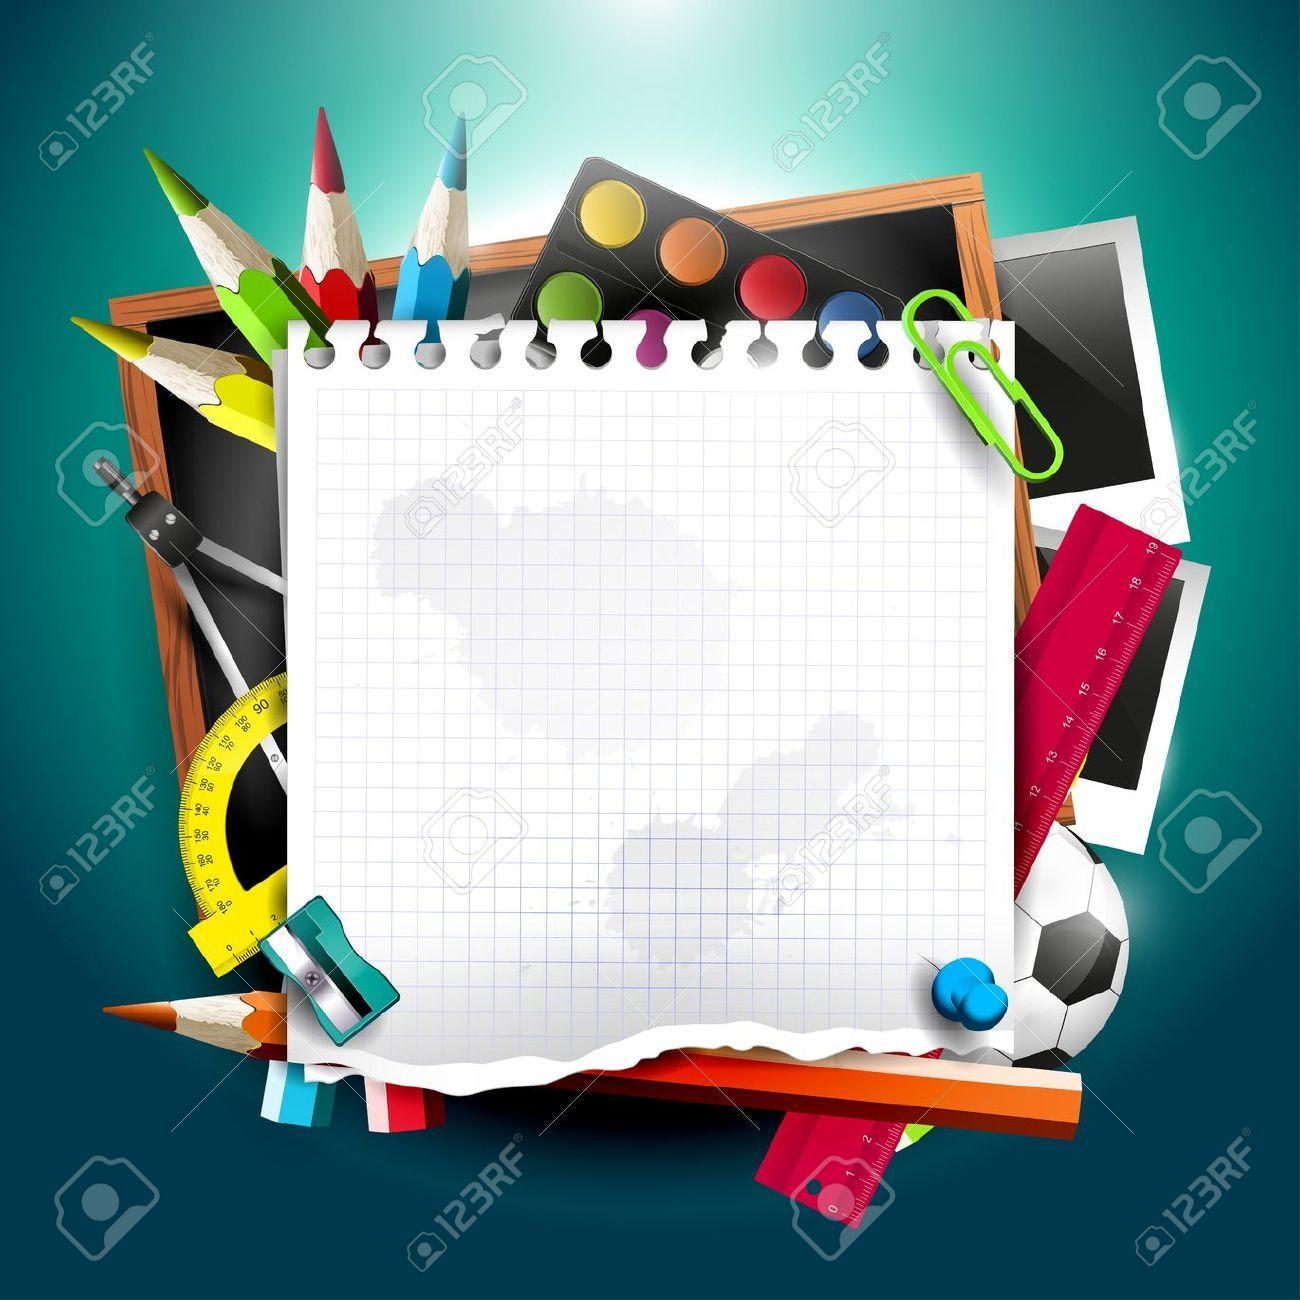 Resultado de imagen para caratulas para secundaria for Caratulas de artes plasticas para secundaria